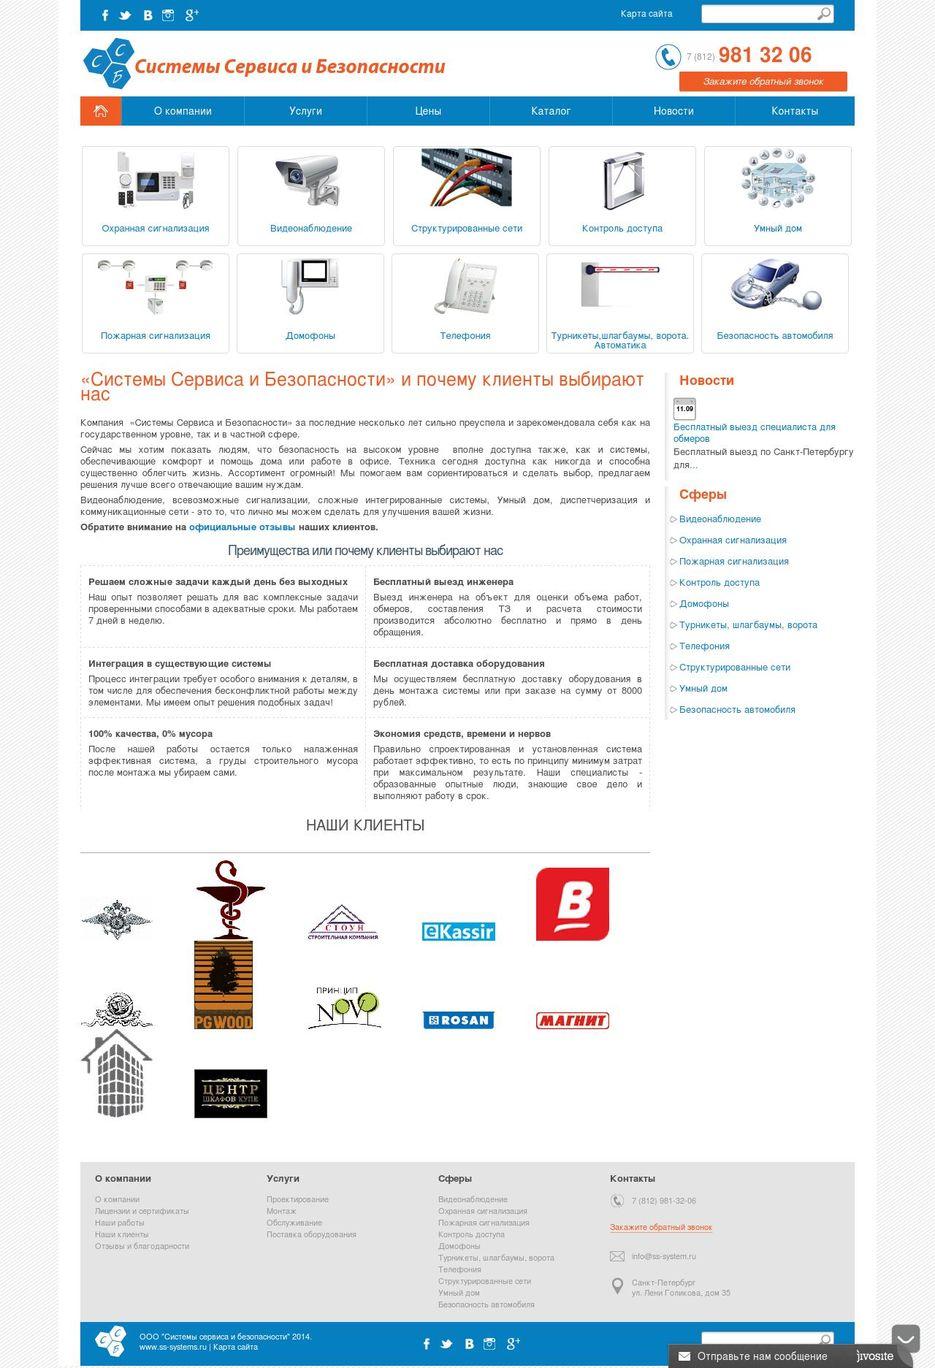 Разработка сайта битрикс петербург семинар битрикс чебоксары